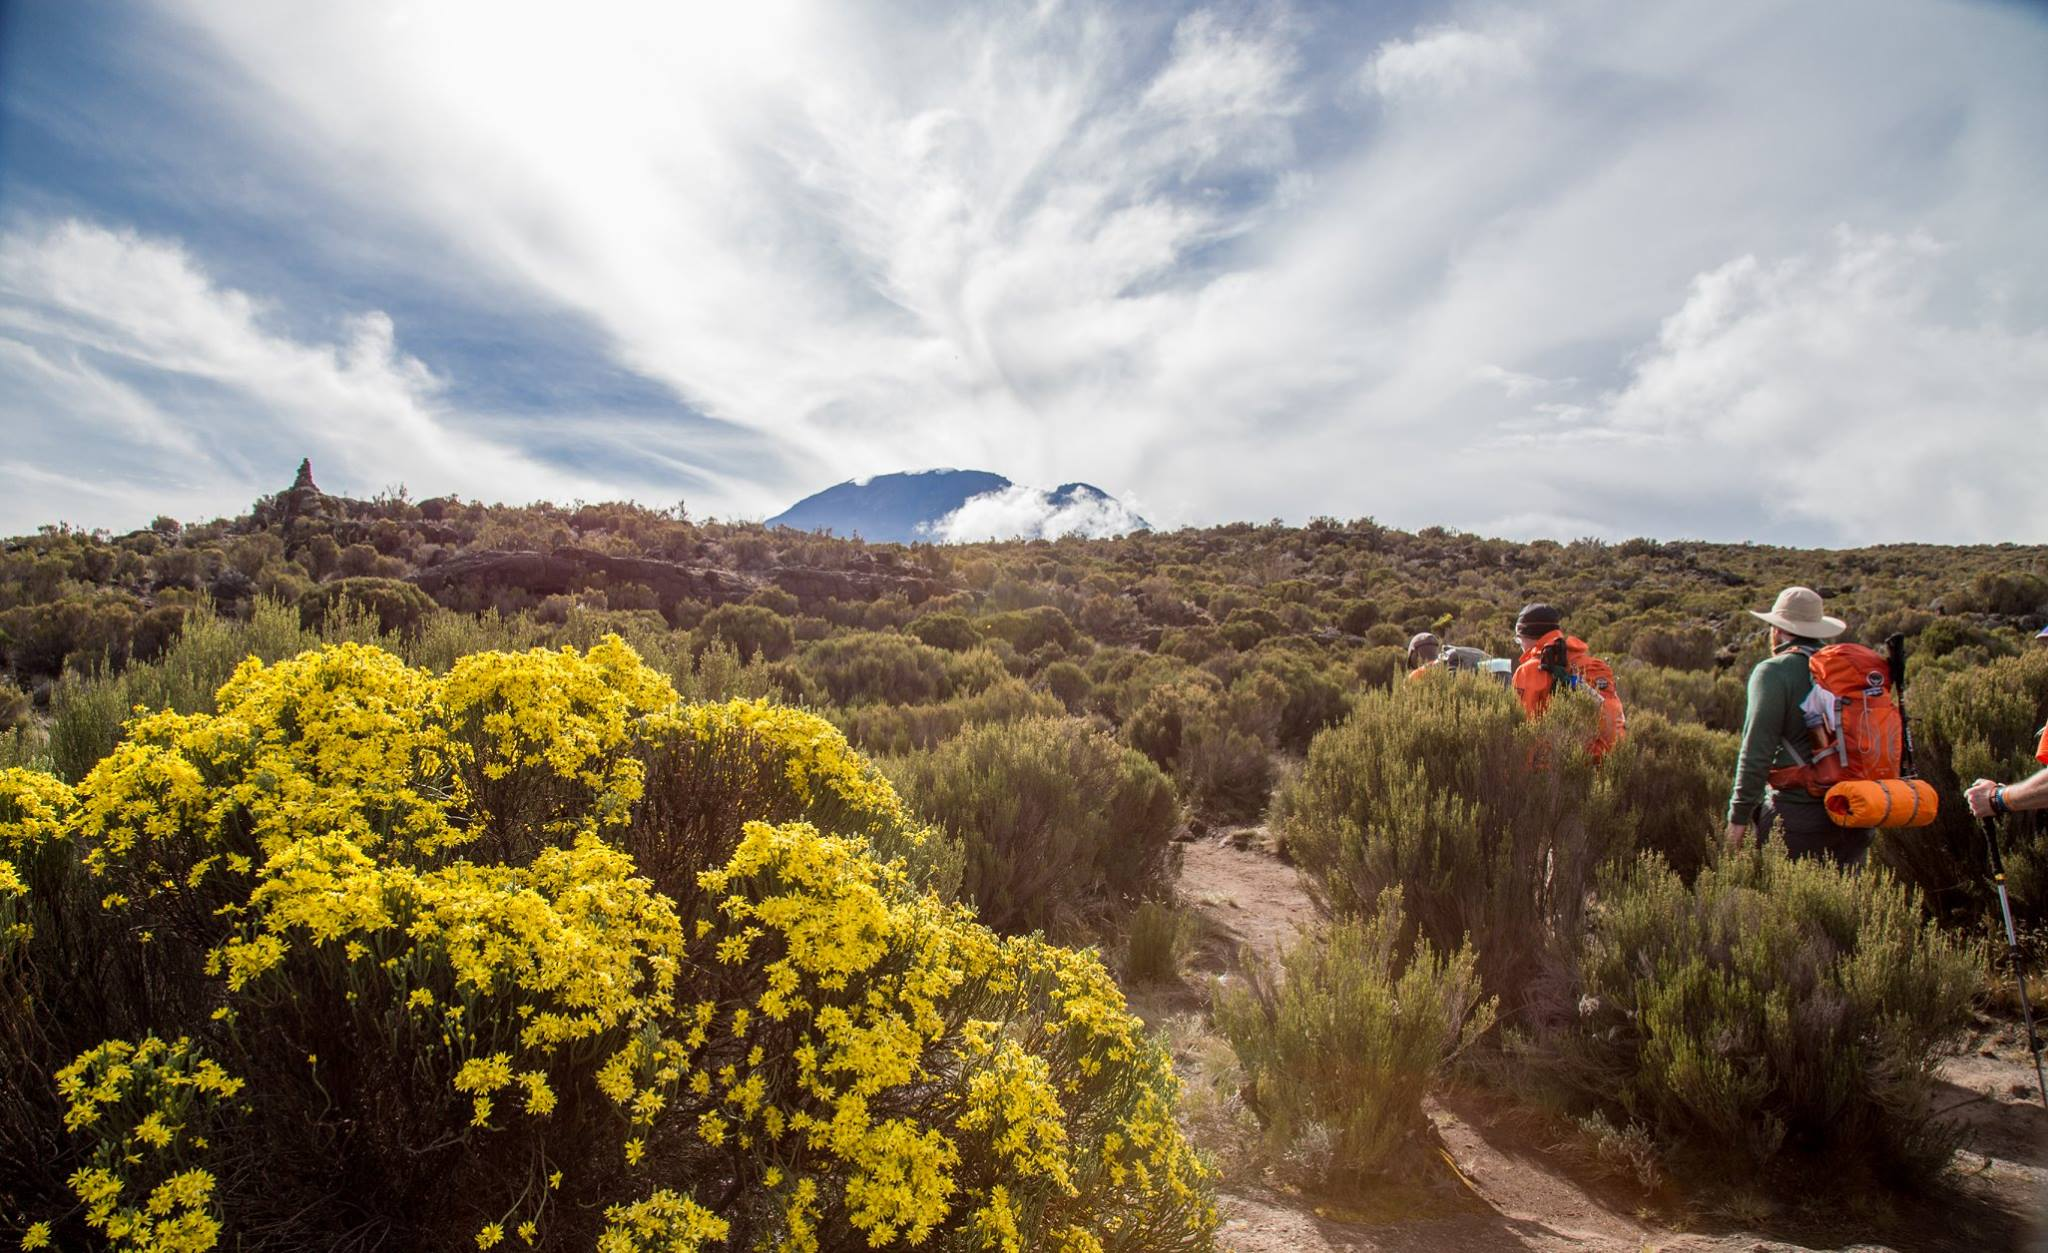 Flowers at Kilimanjaro National Park